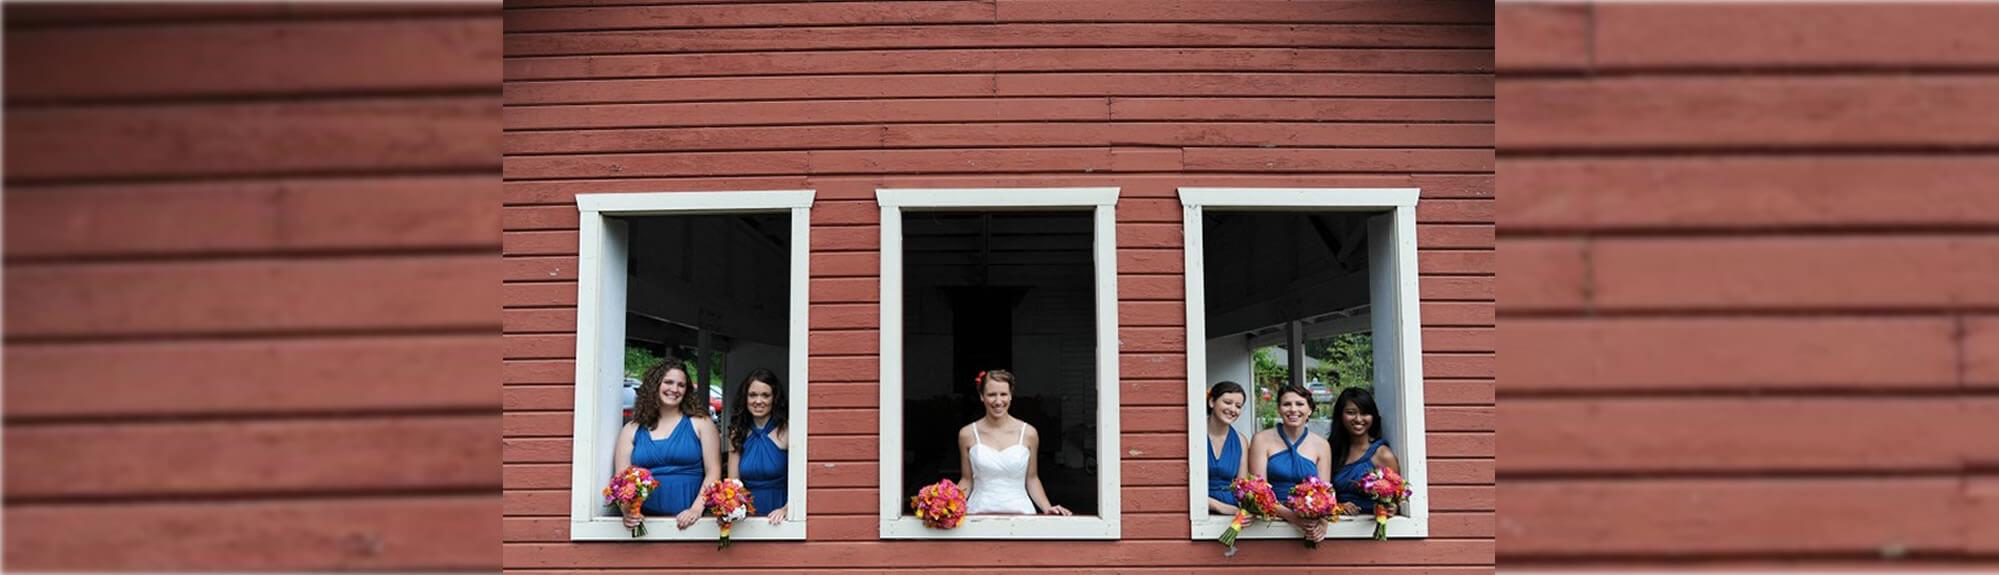 Bridal Party Picnic Shelter Windows